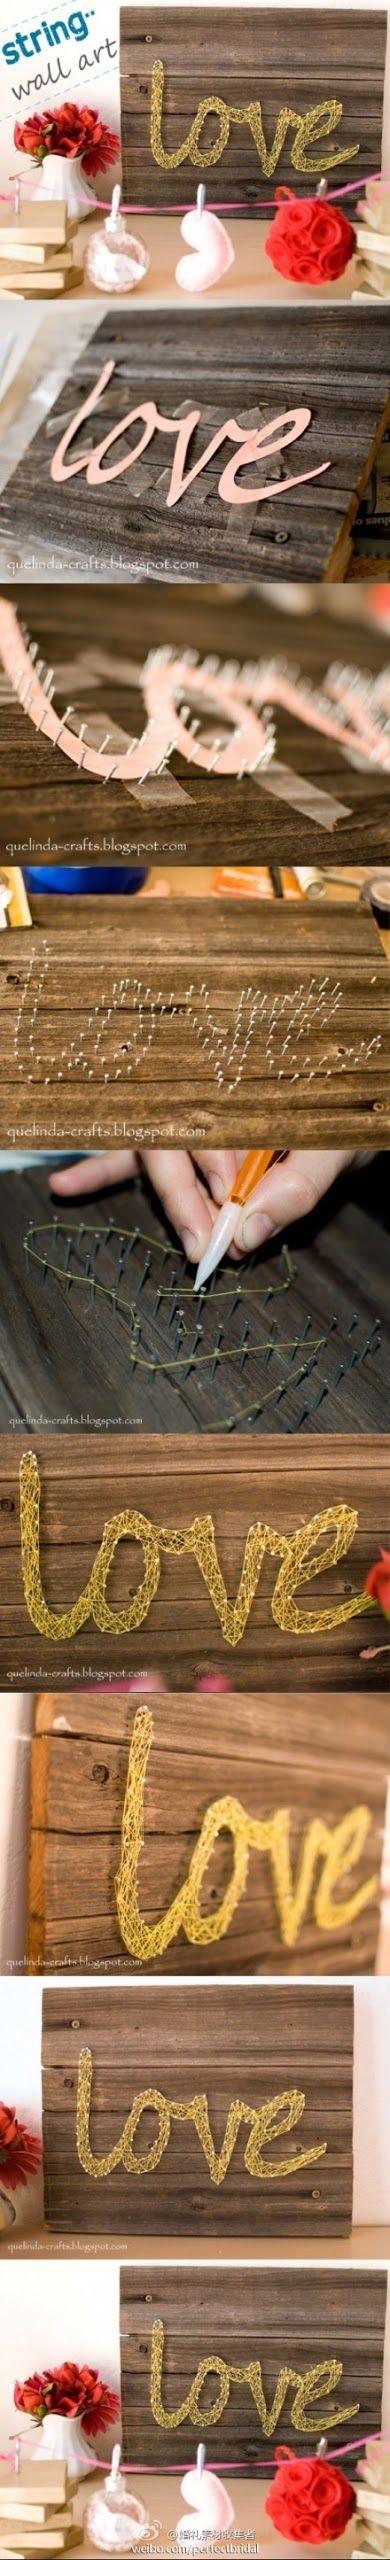 Diy Project : String Wall Art